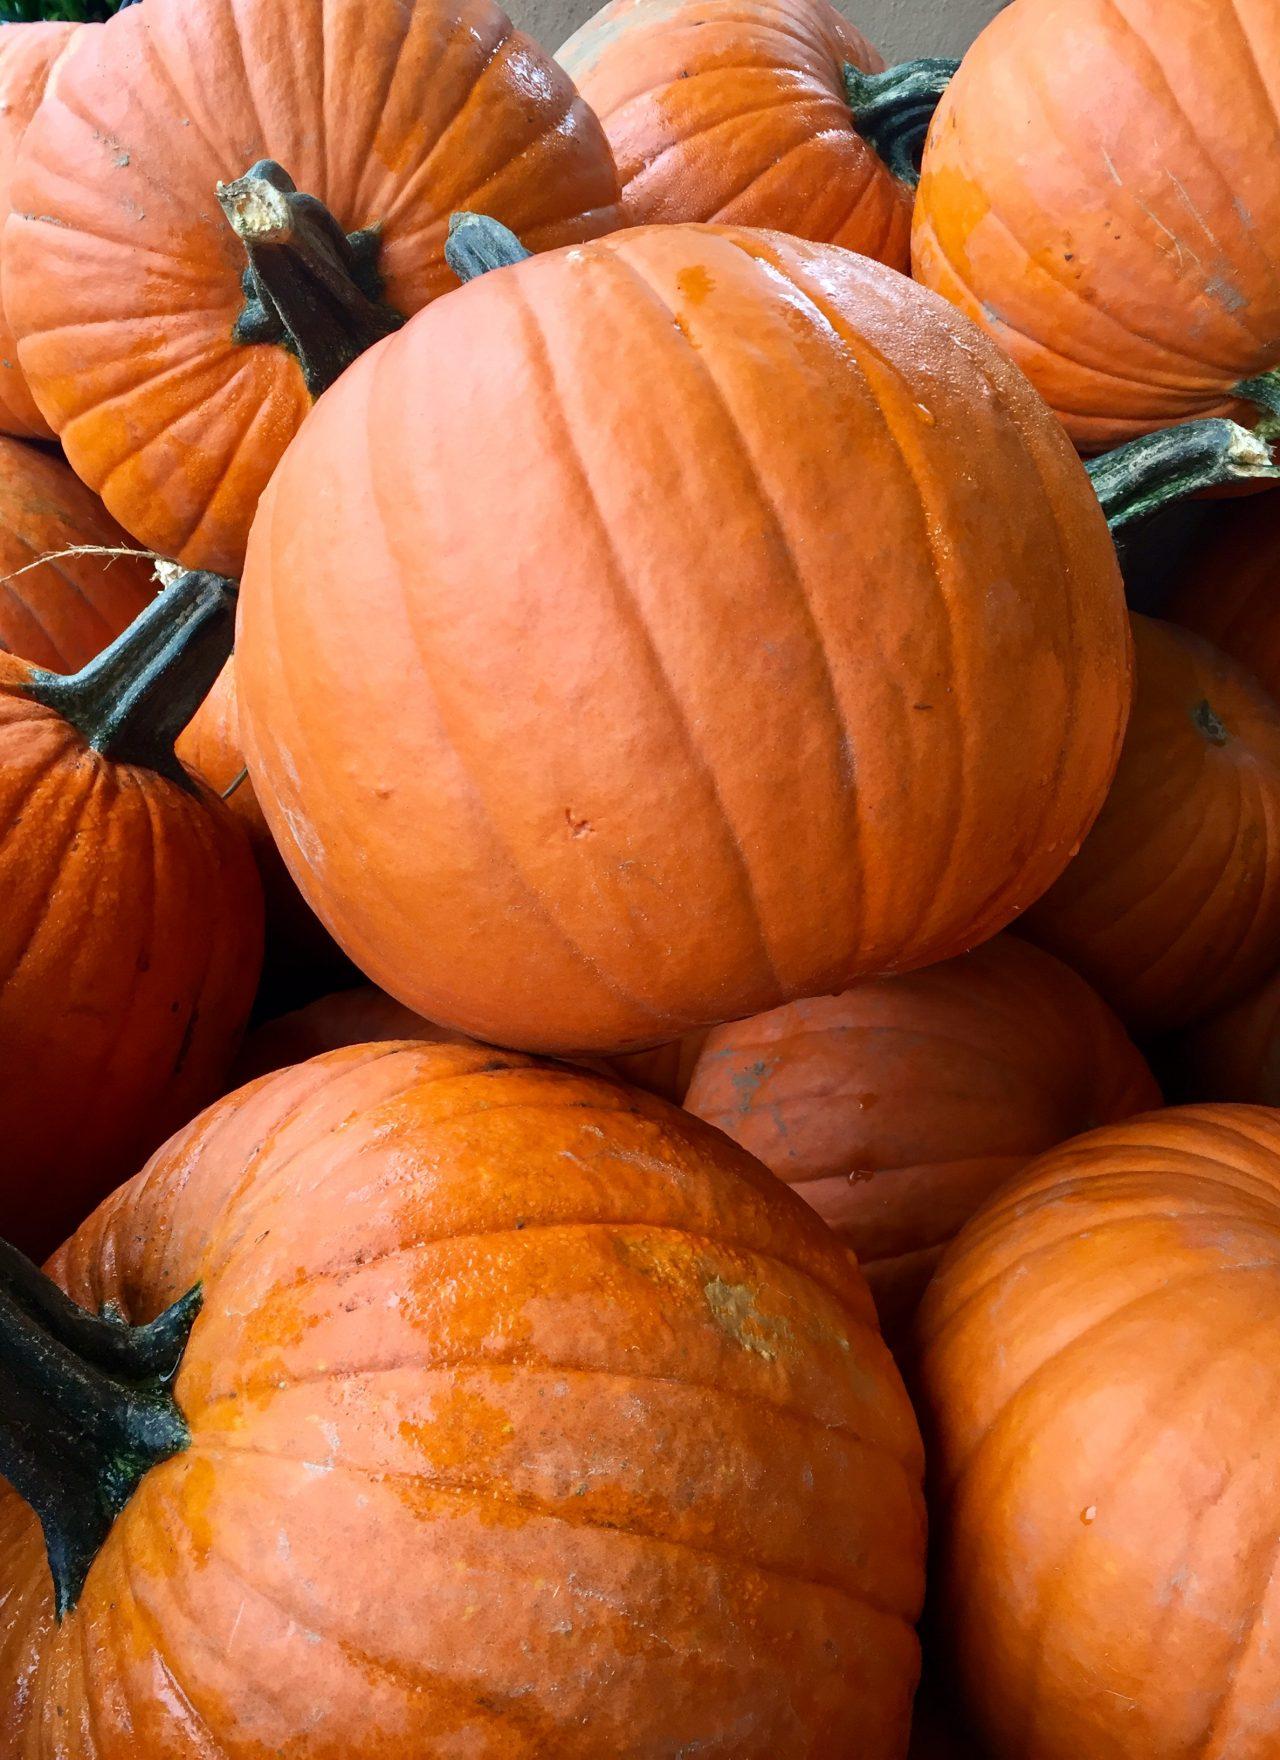 The October Agenda